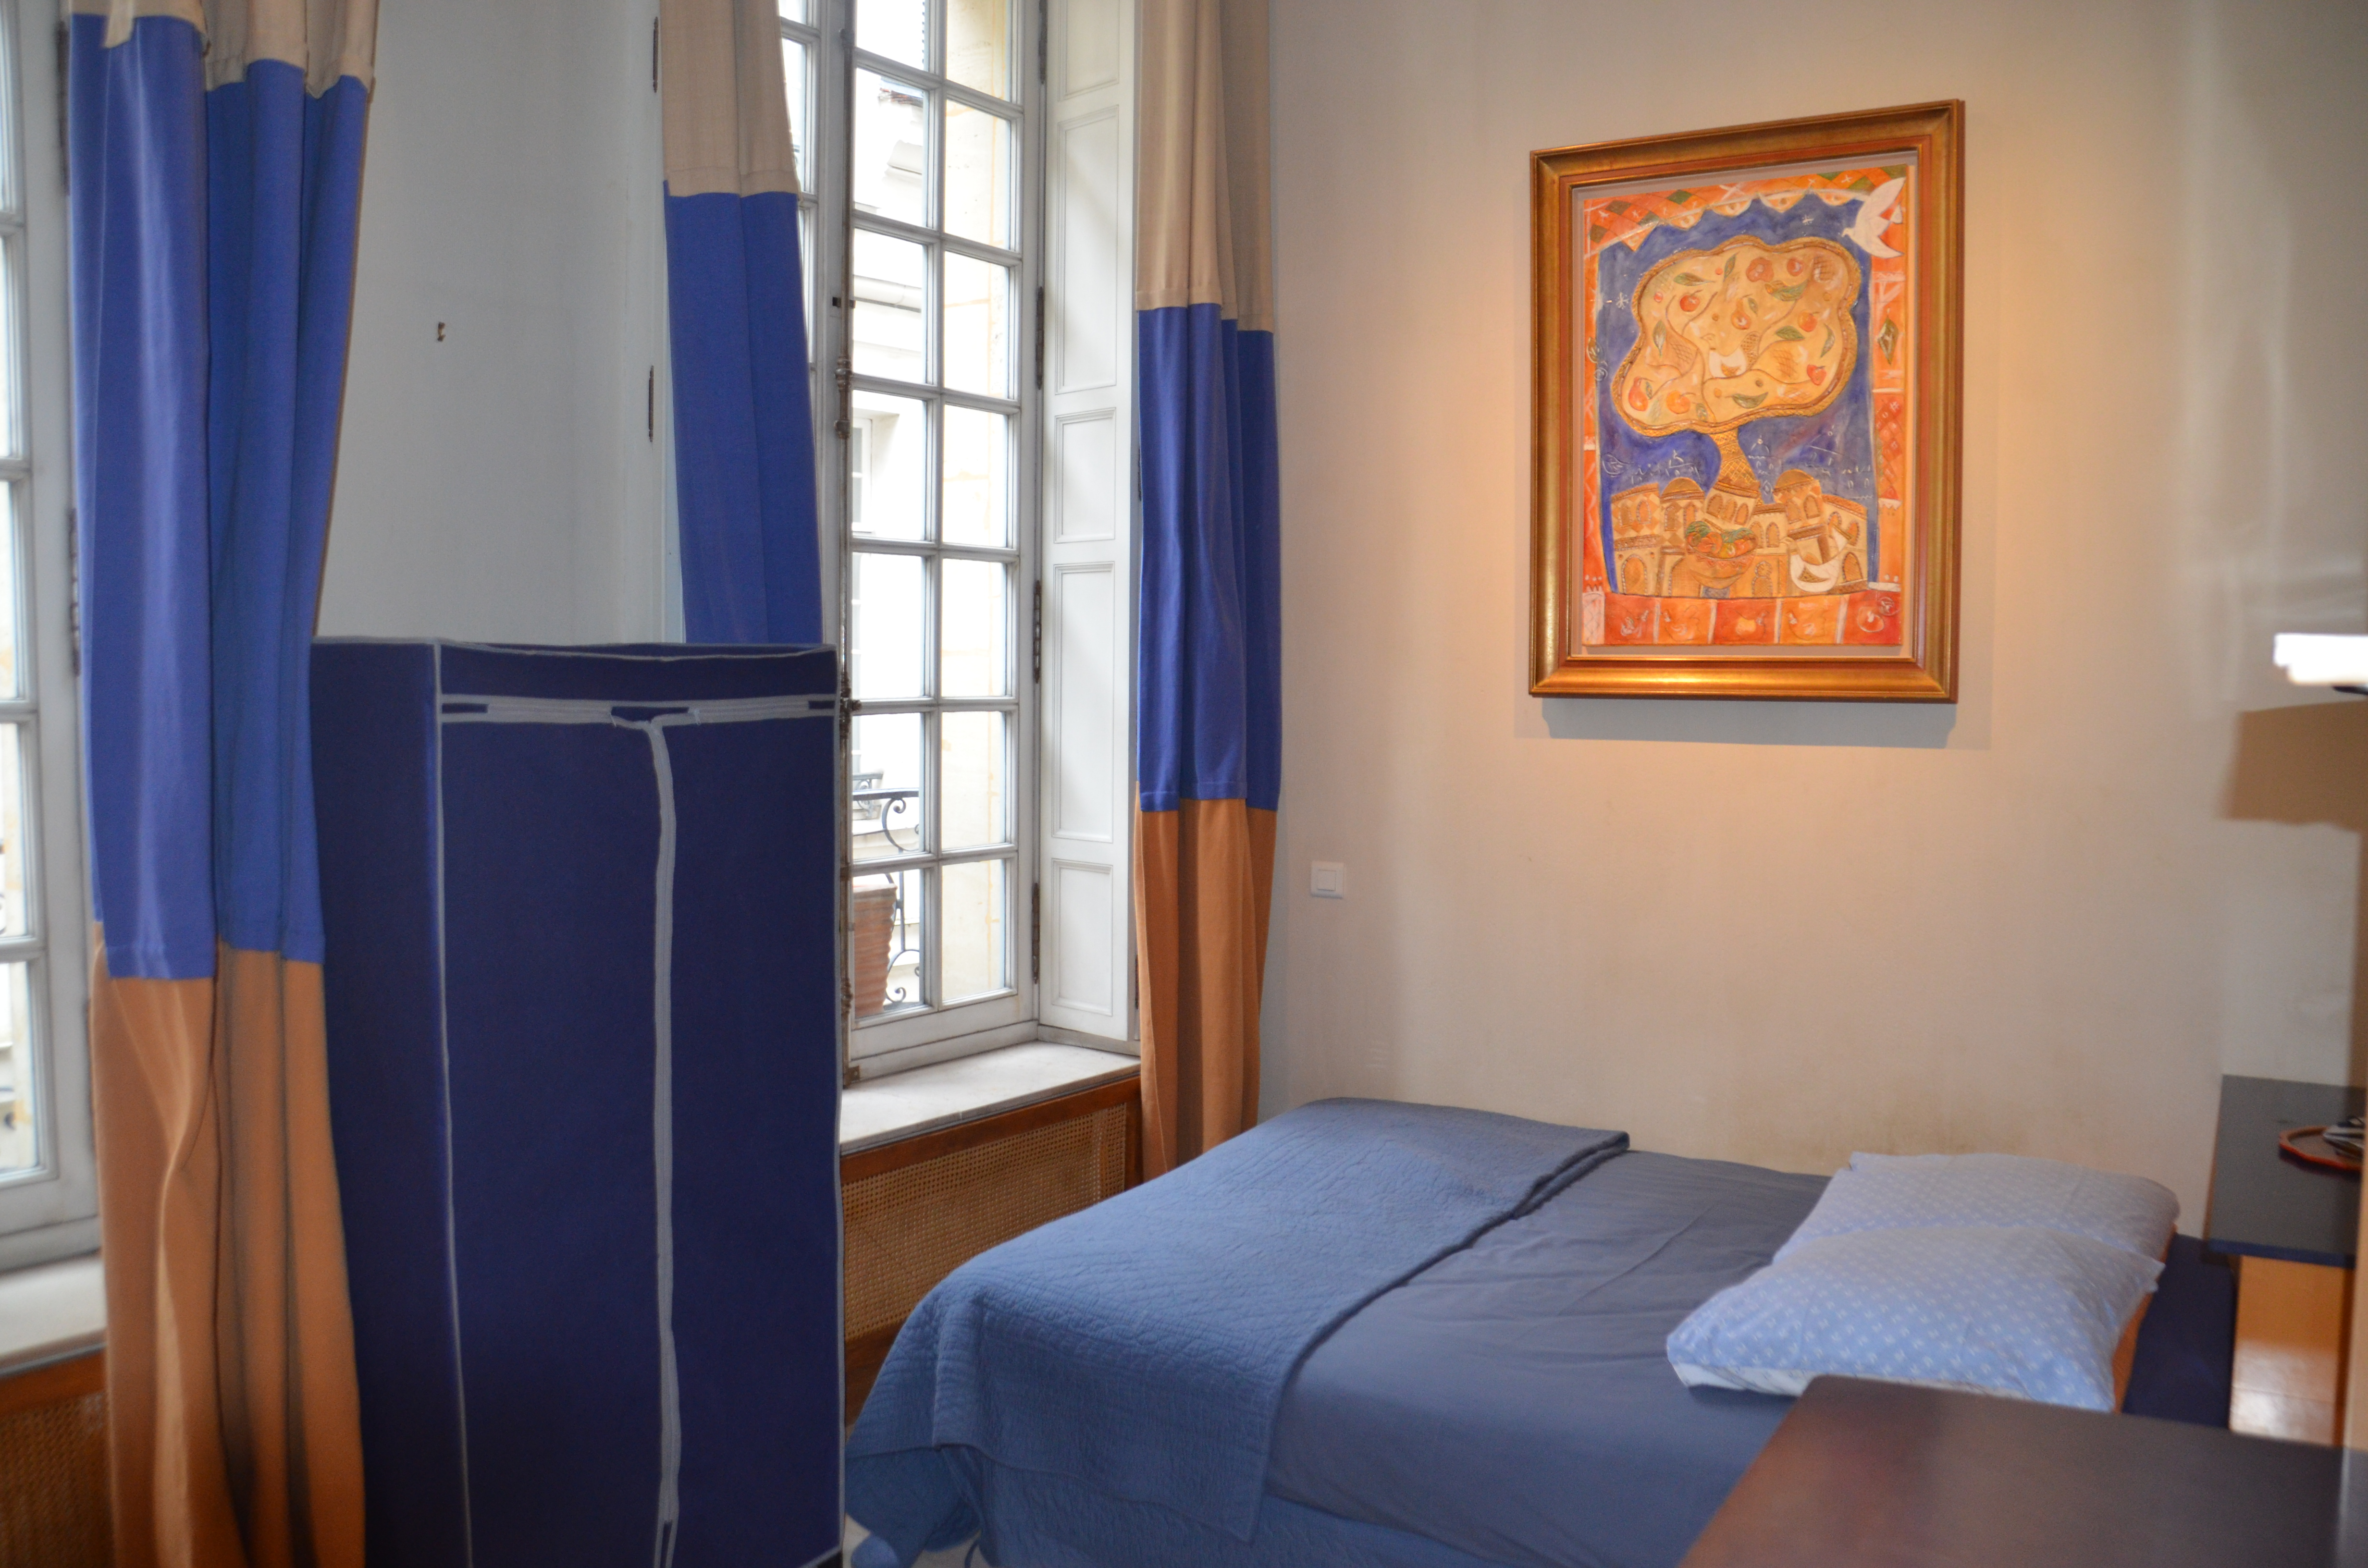 bed up prix - 28 images - promo lit escamotable plafond affordable